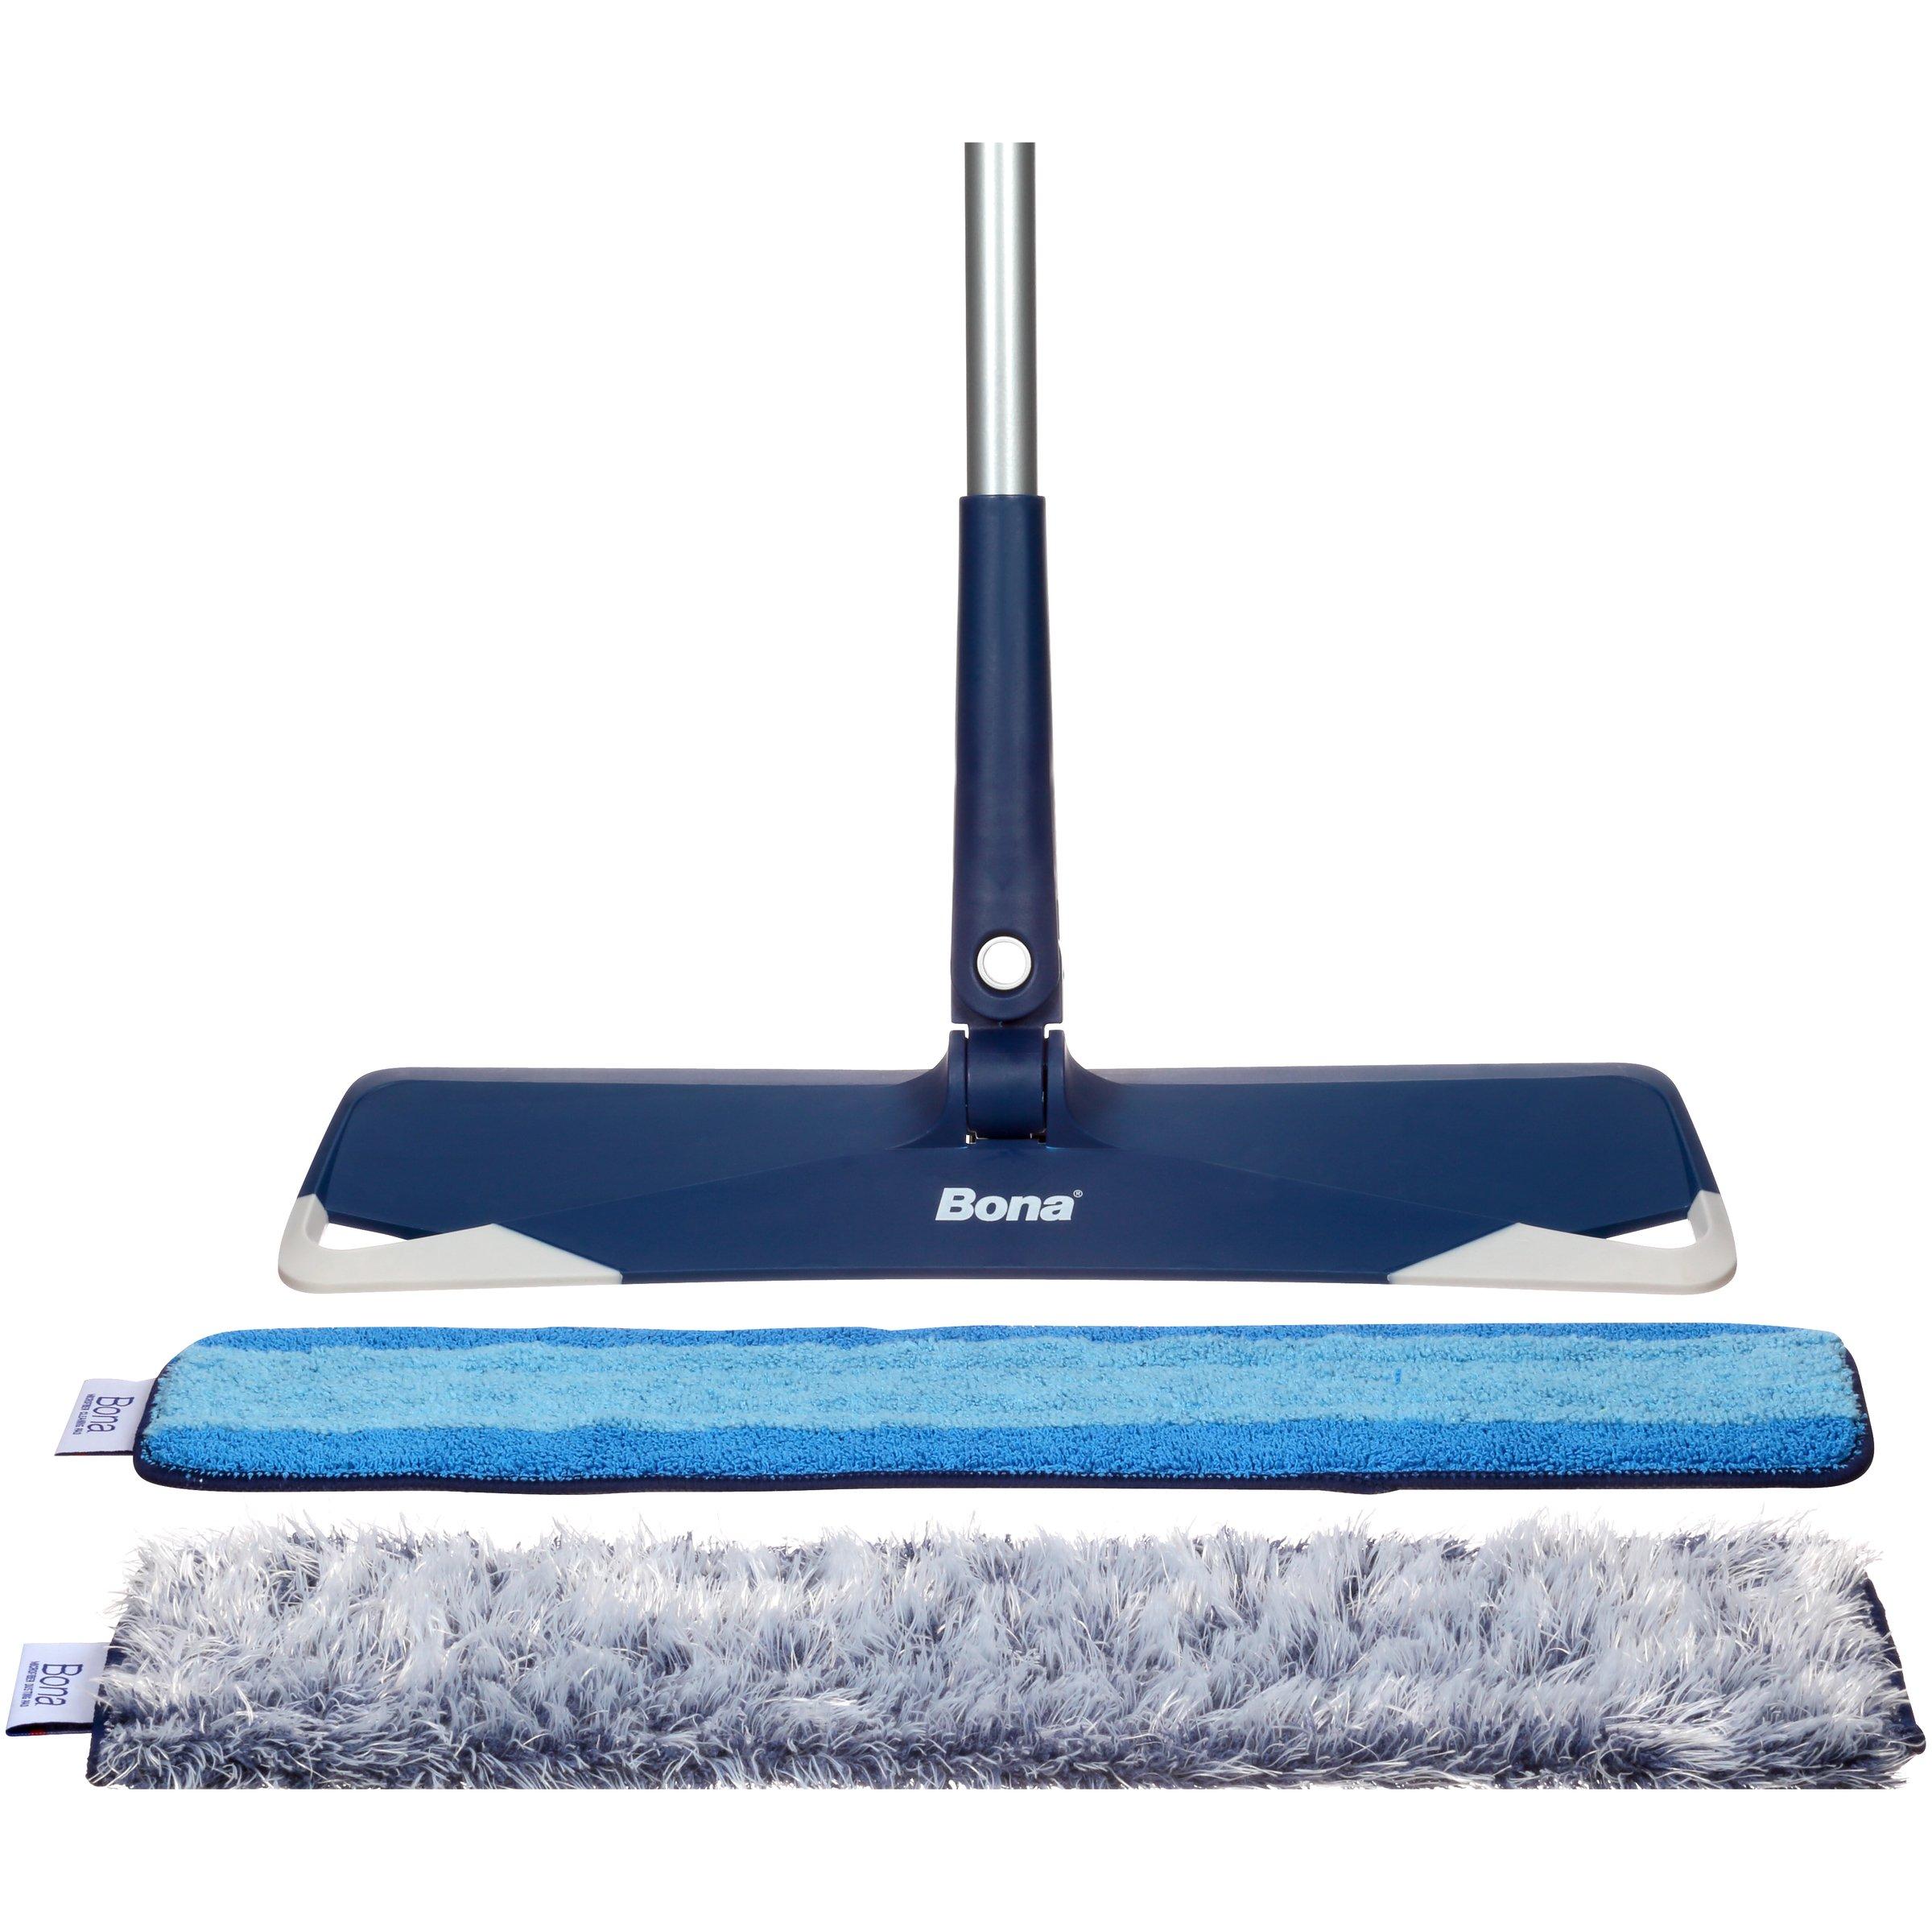 Bona Multi-Surface Floor Premium Microfiber Mop by Bona (Image #2)